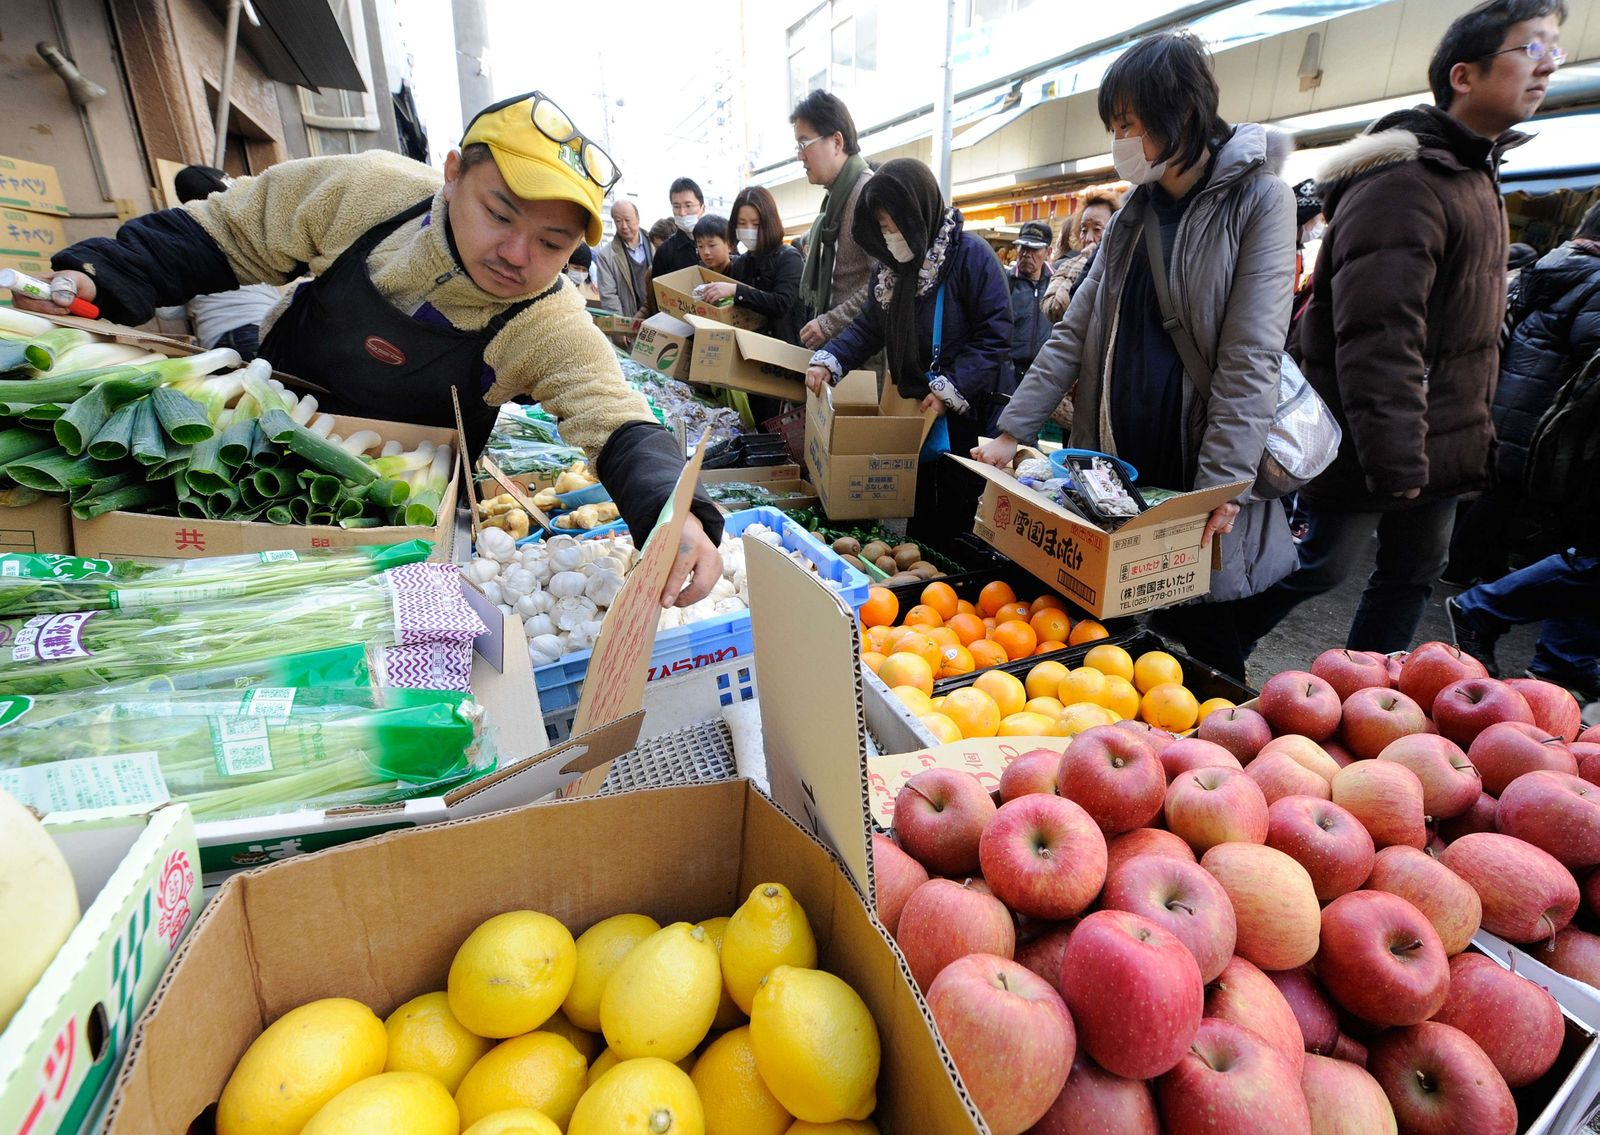 Japan Erdbeben Samstag Menschen